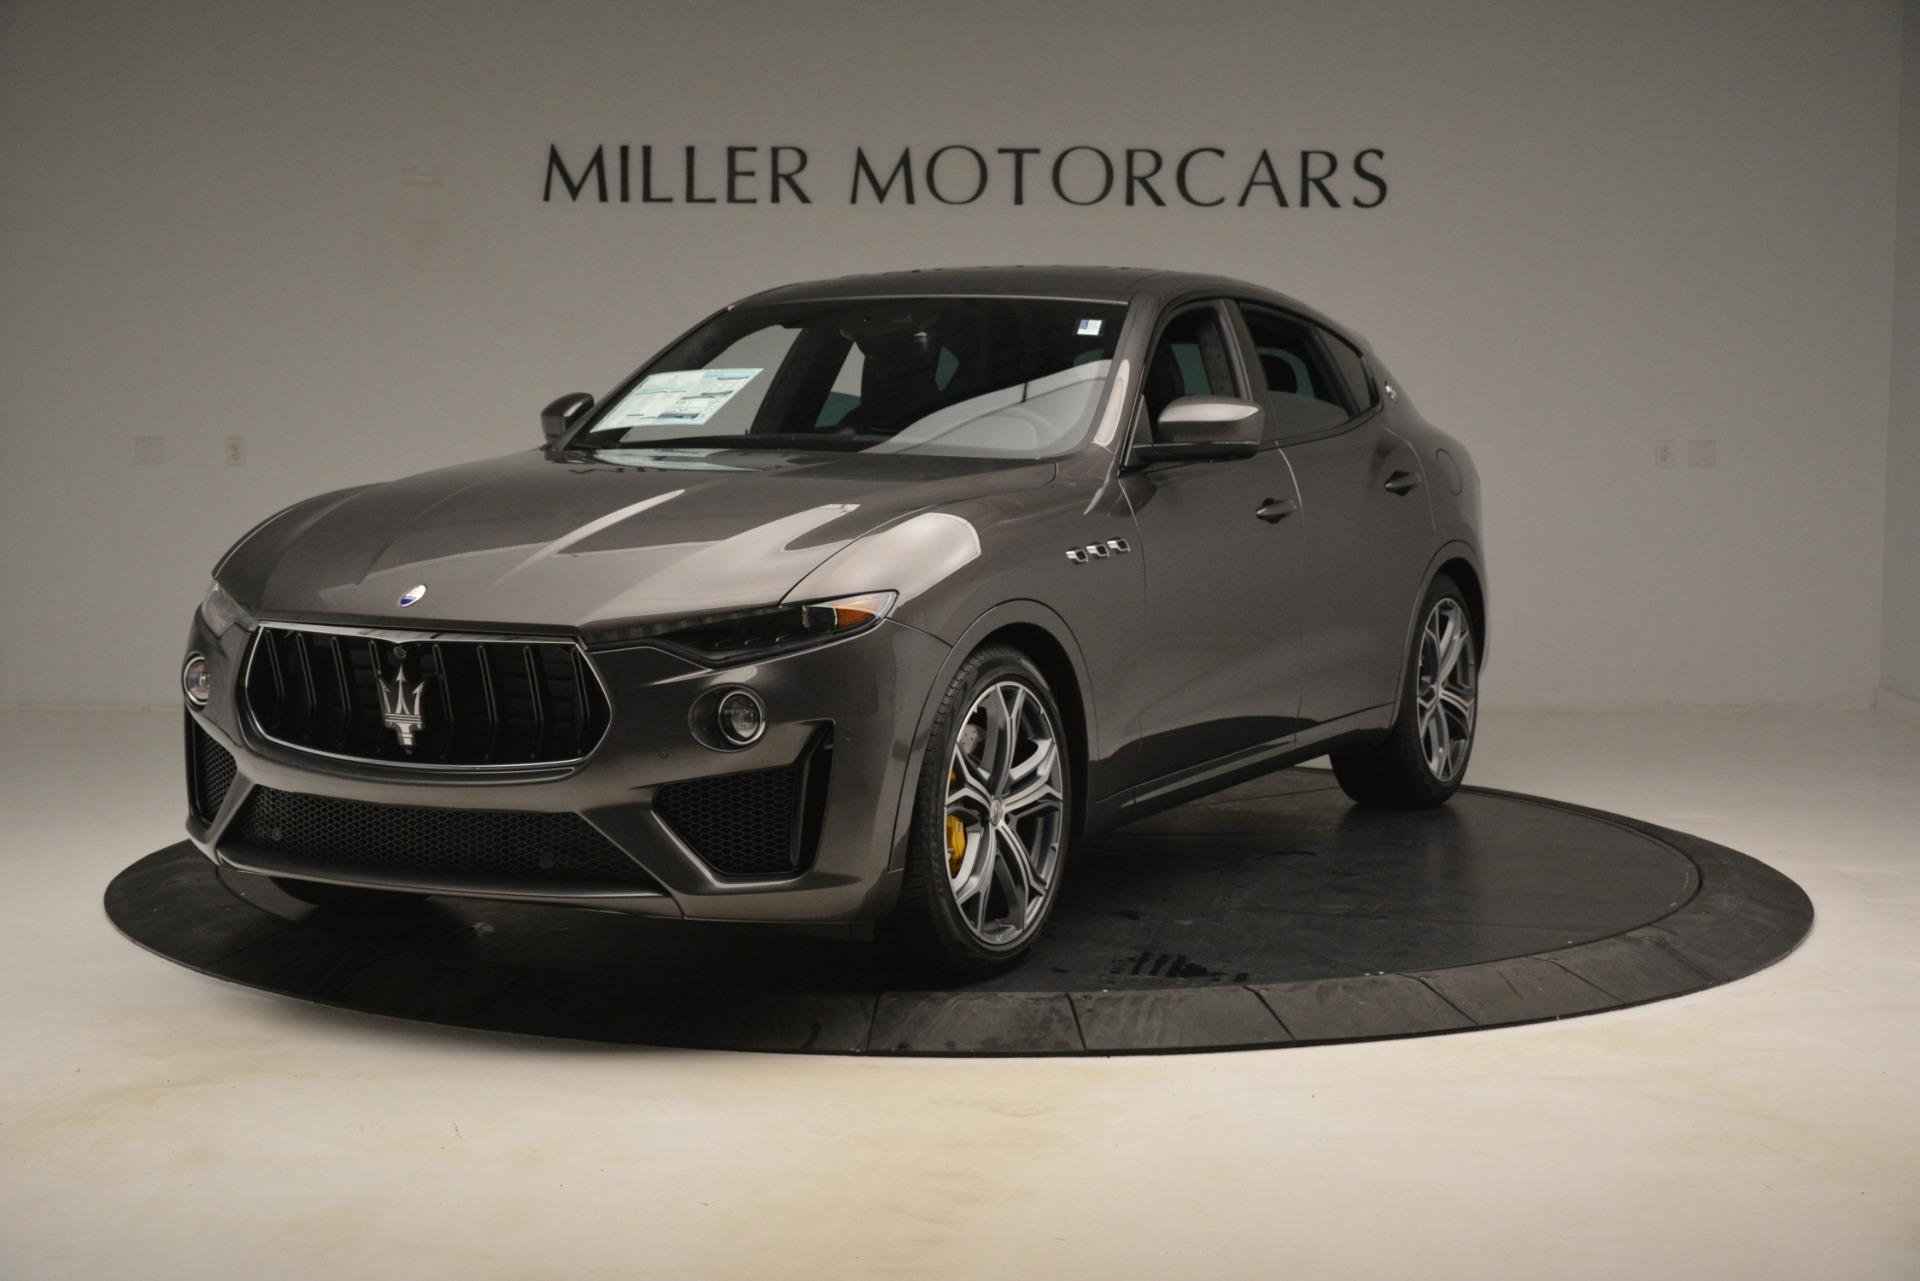 New 2019 Maserati Levante GTS For Sale In Westport, CT 3015_main